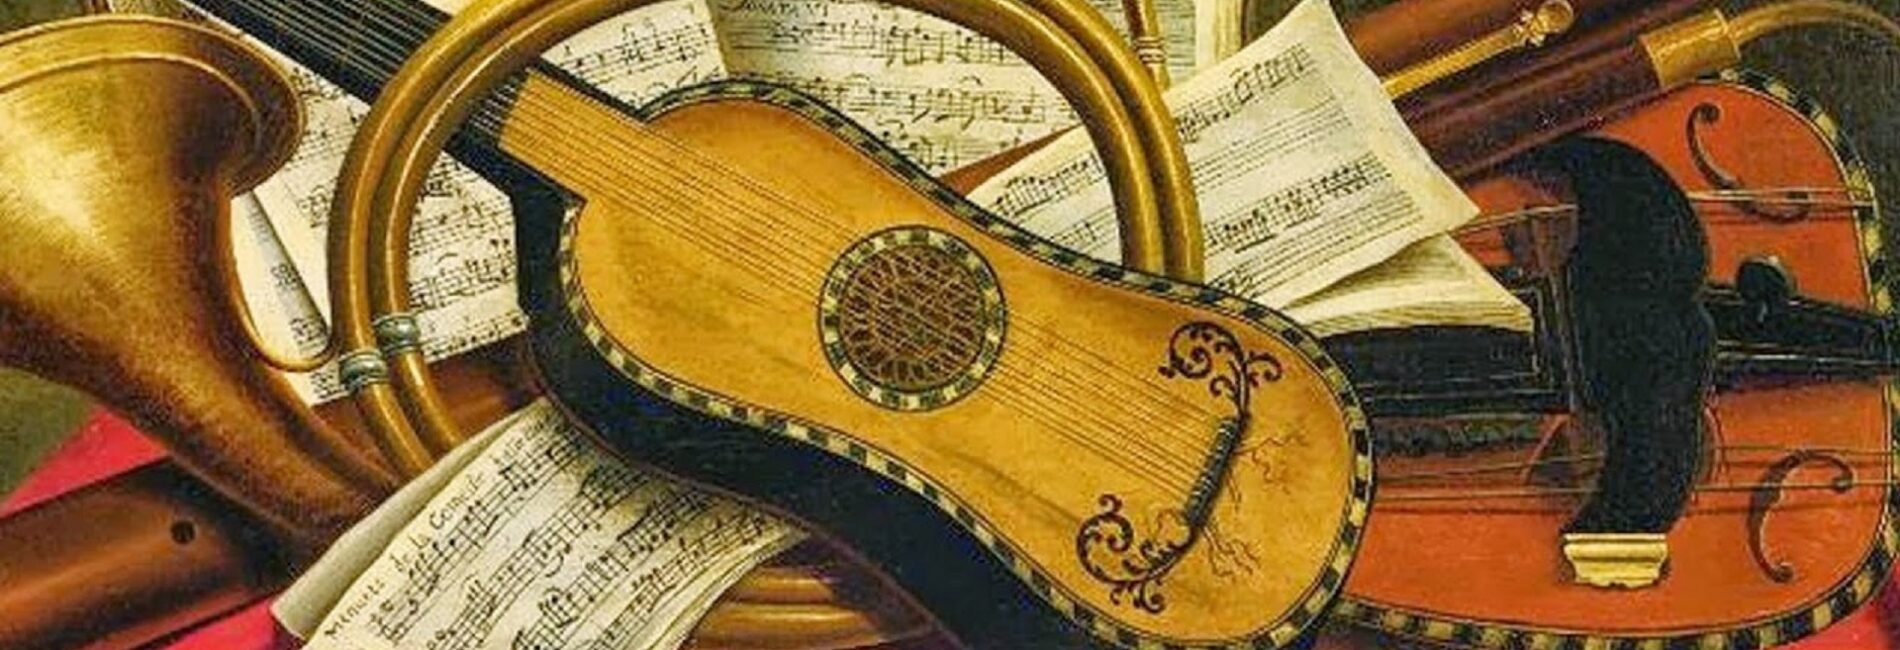 Урок №2. Русская музыка XVIII века